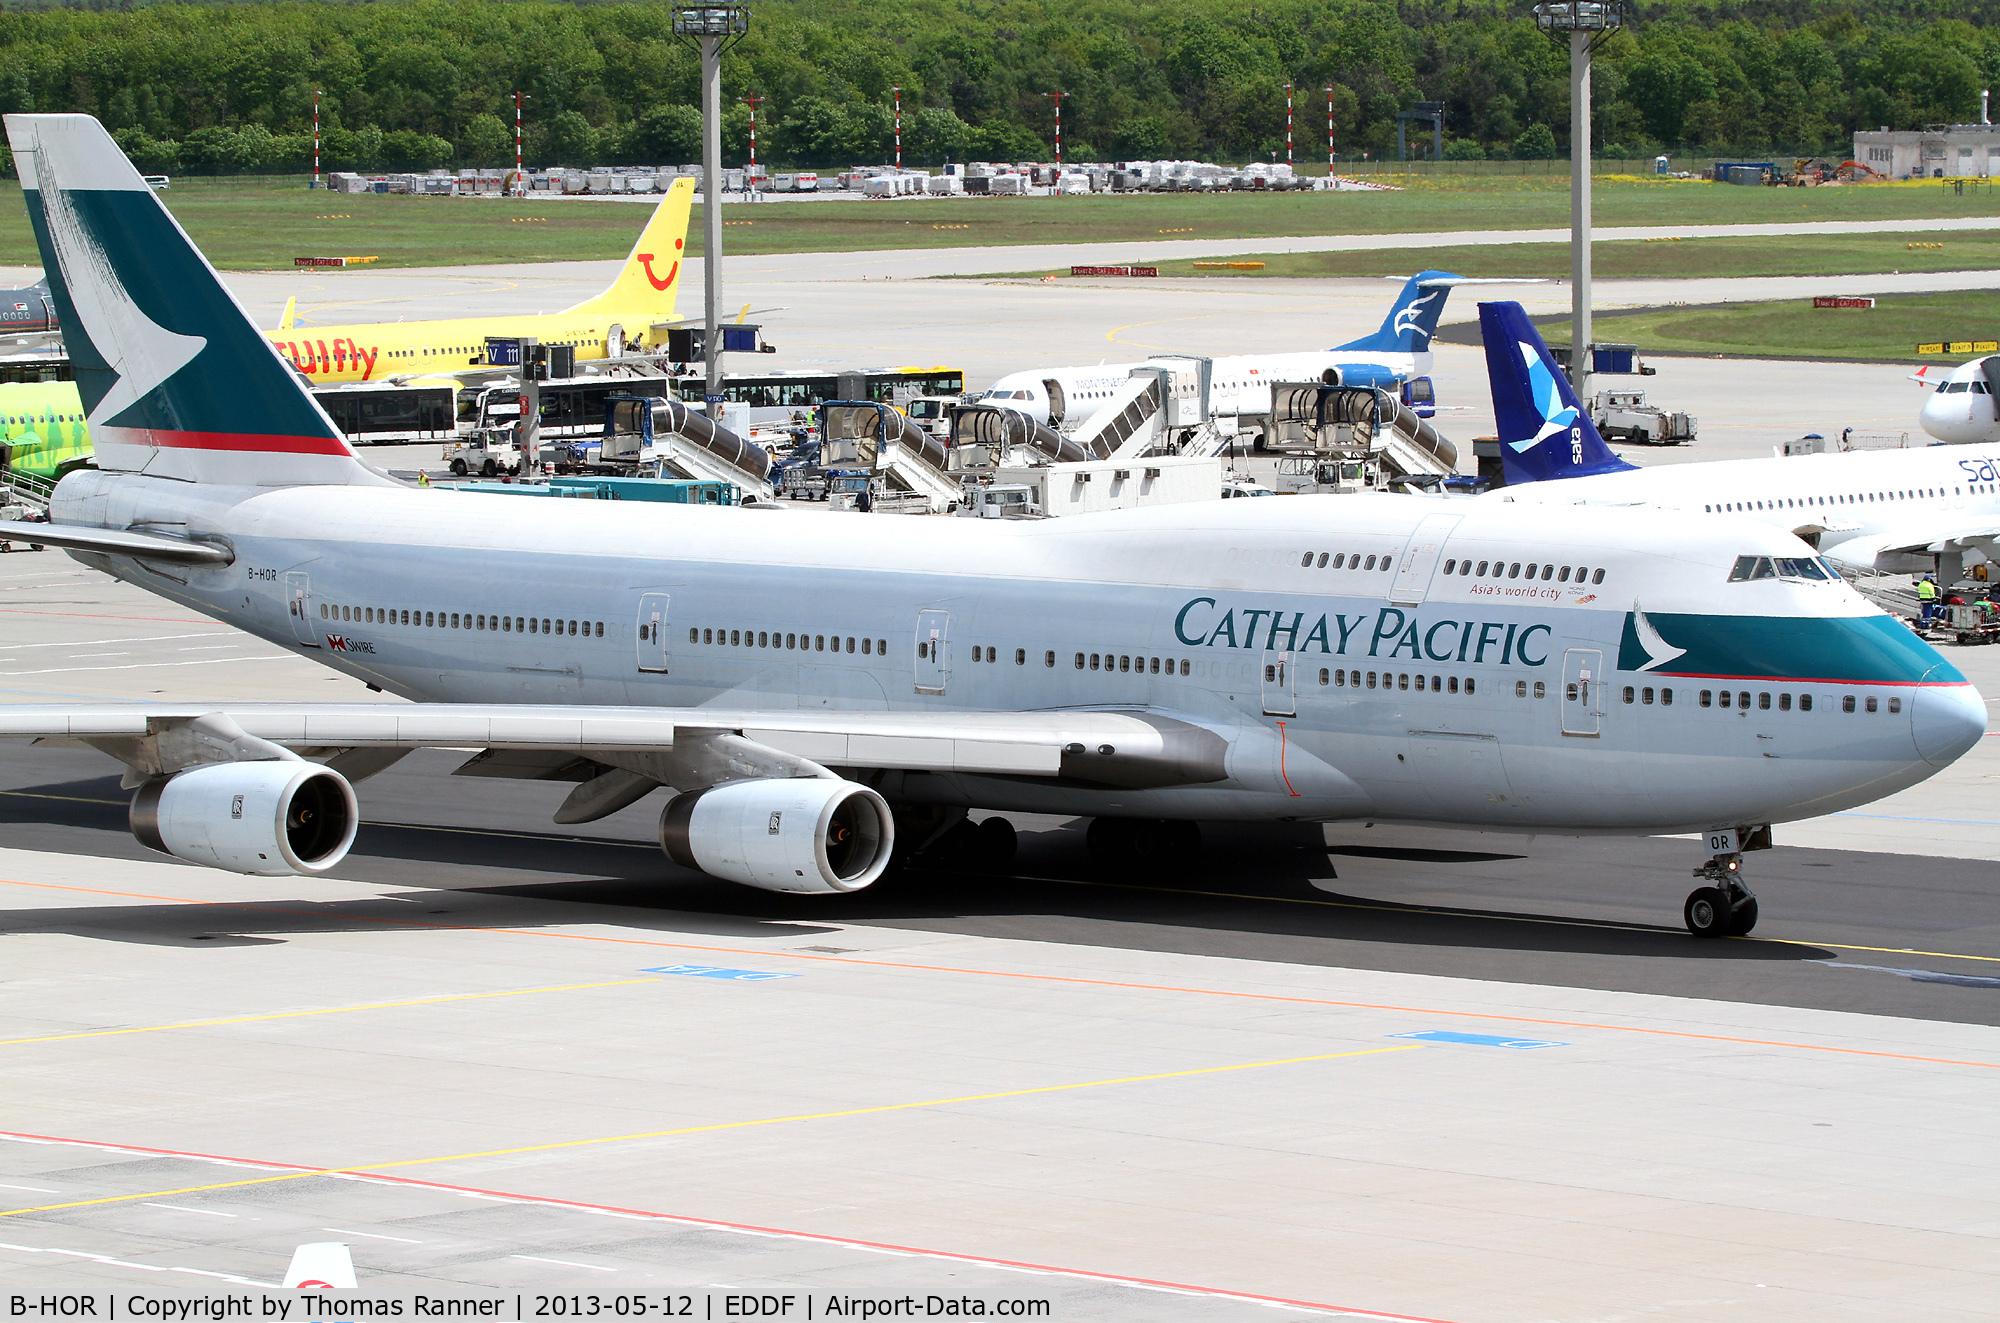 B-HOR, 1990 Boeing 747-467 C/N 24631, Cathay Pacific B747